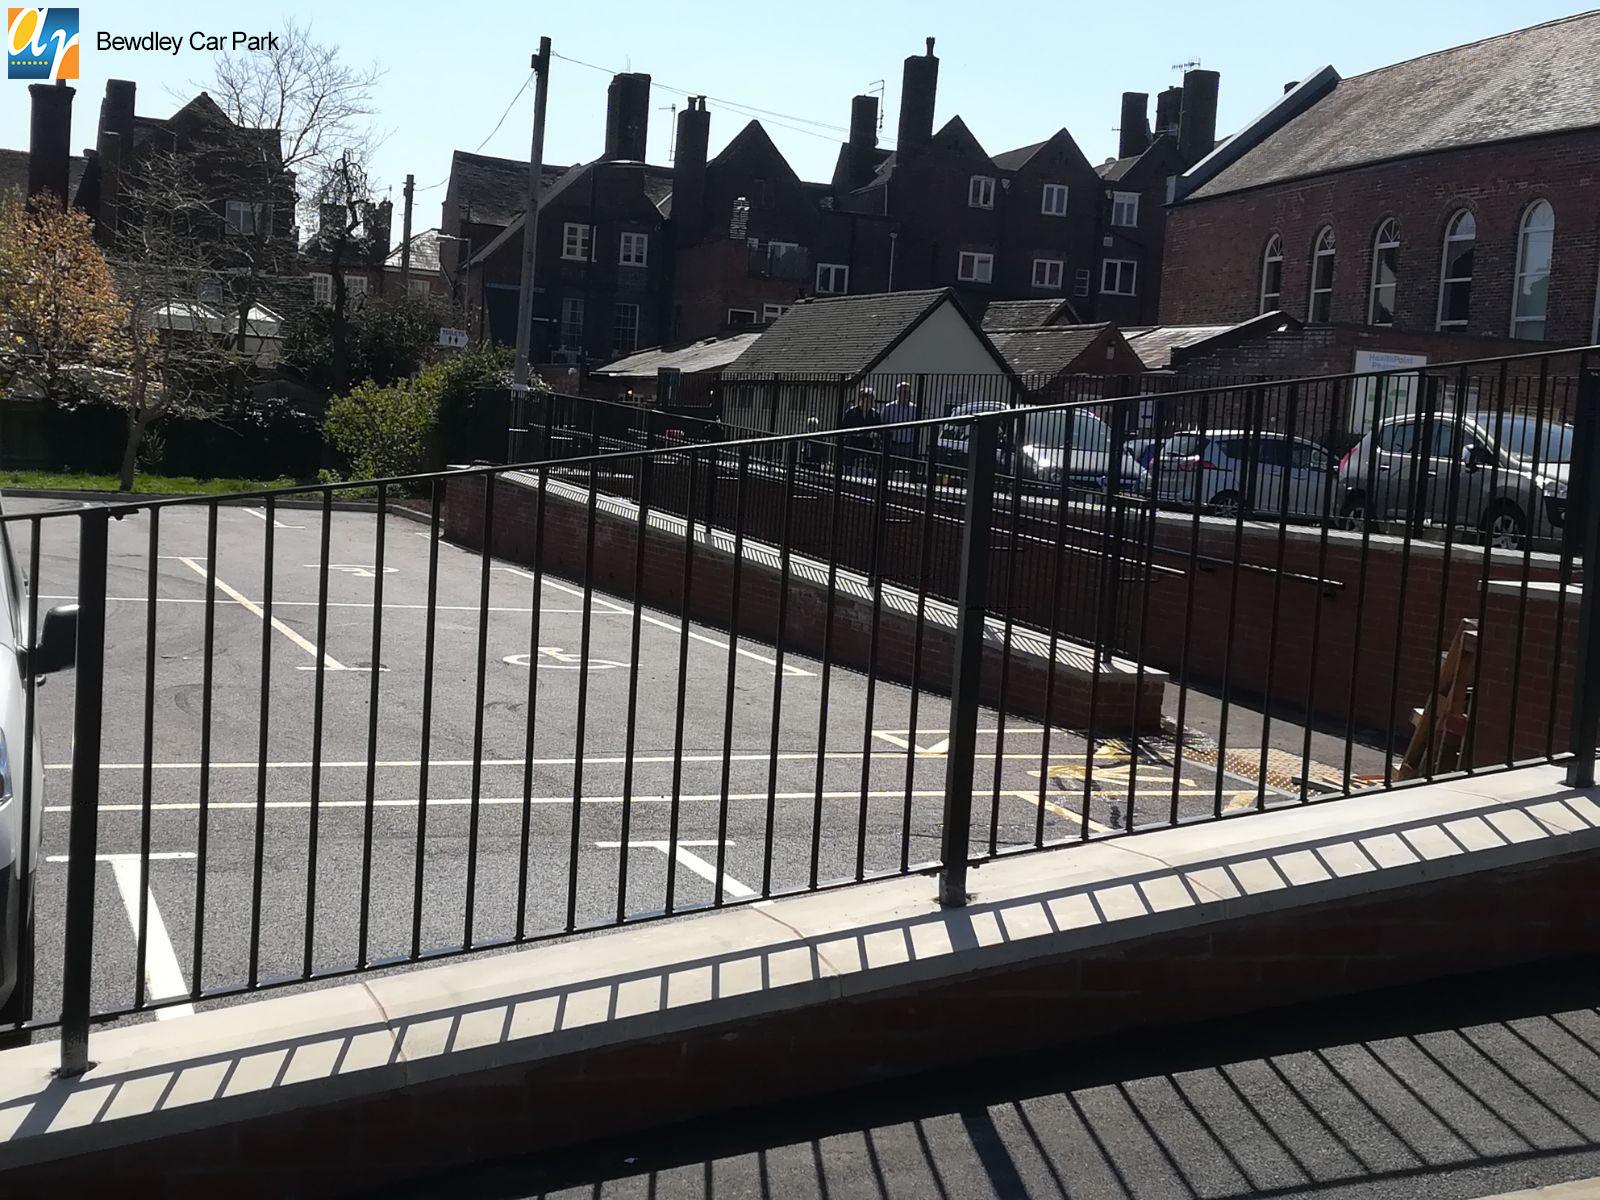 Bewdley Car Park